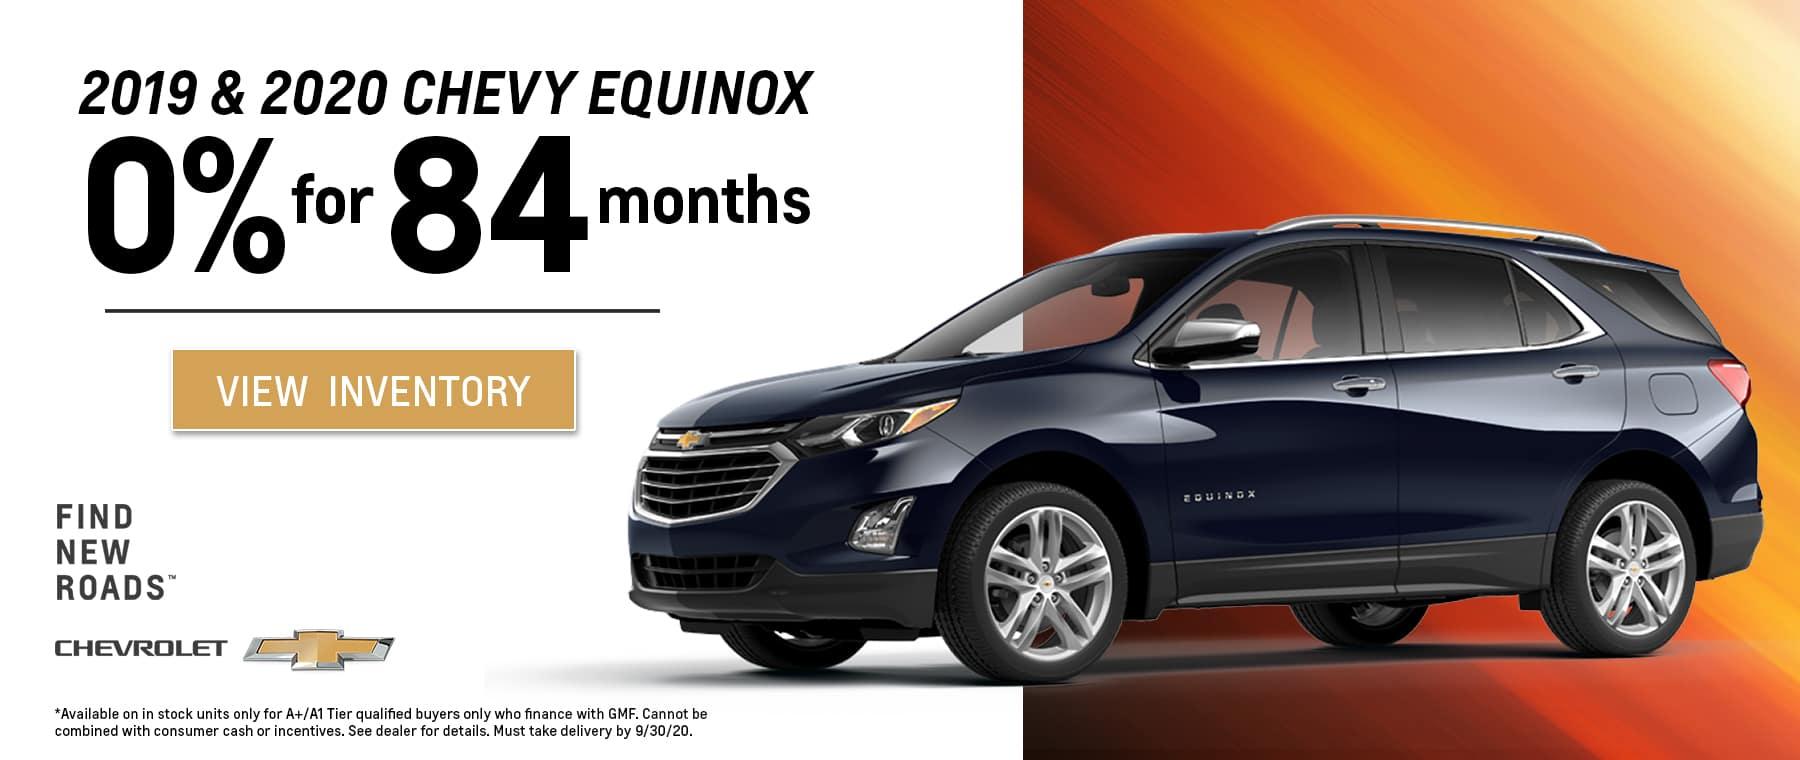 RH-Chevrolet-Naples—-Sept20_TR_Banners-equinox-1800×760 (1)